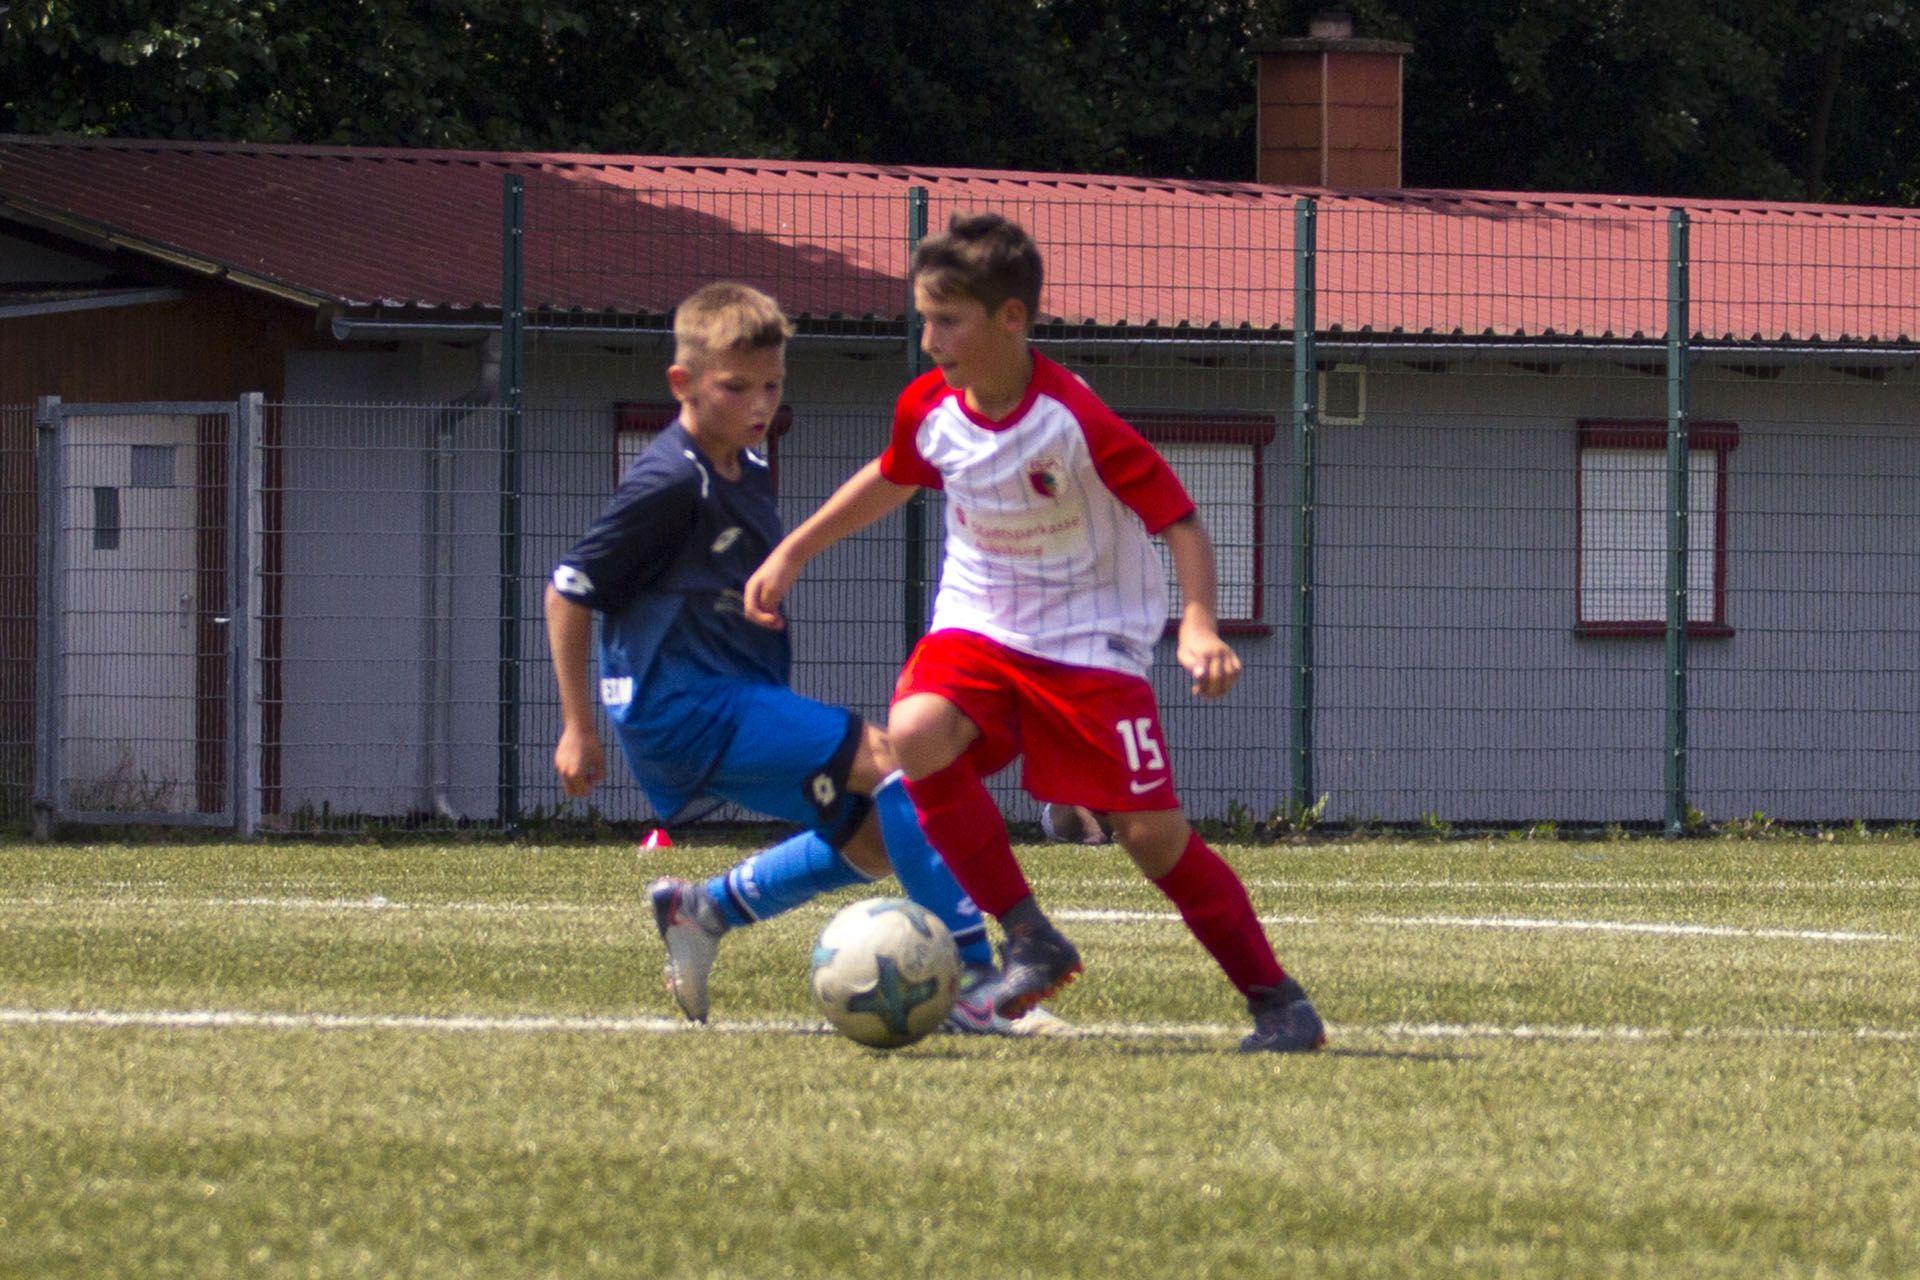 U19: Generalprobe vor Bundesliga-Auftakt geglückt